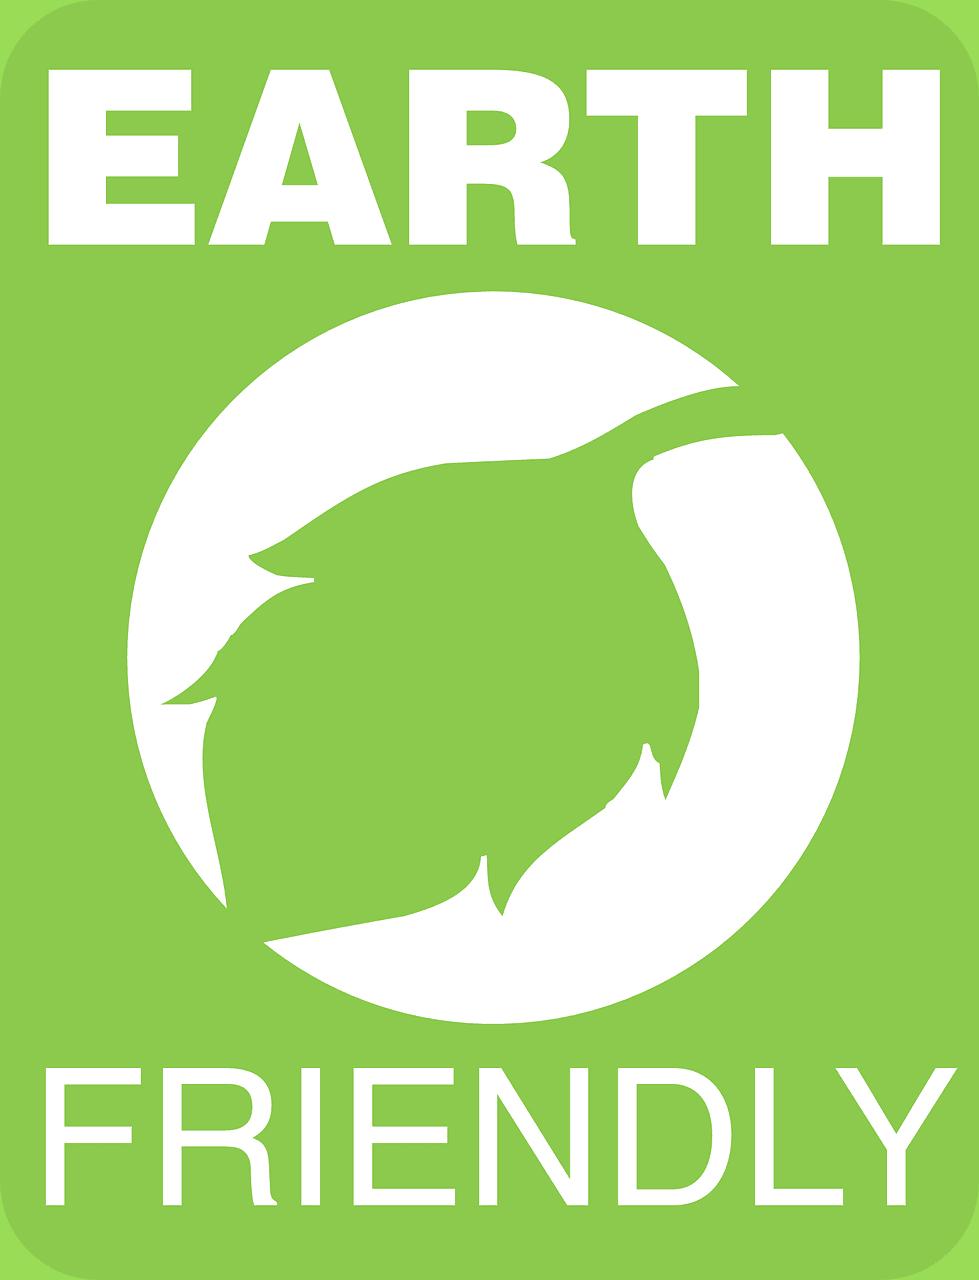 Green environment symbol